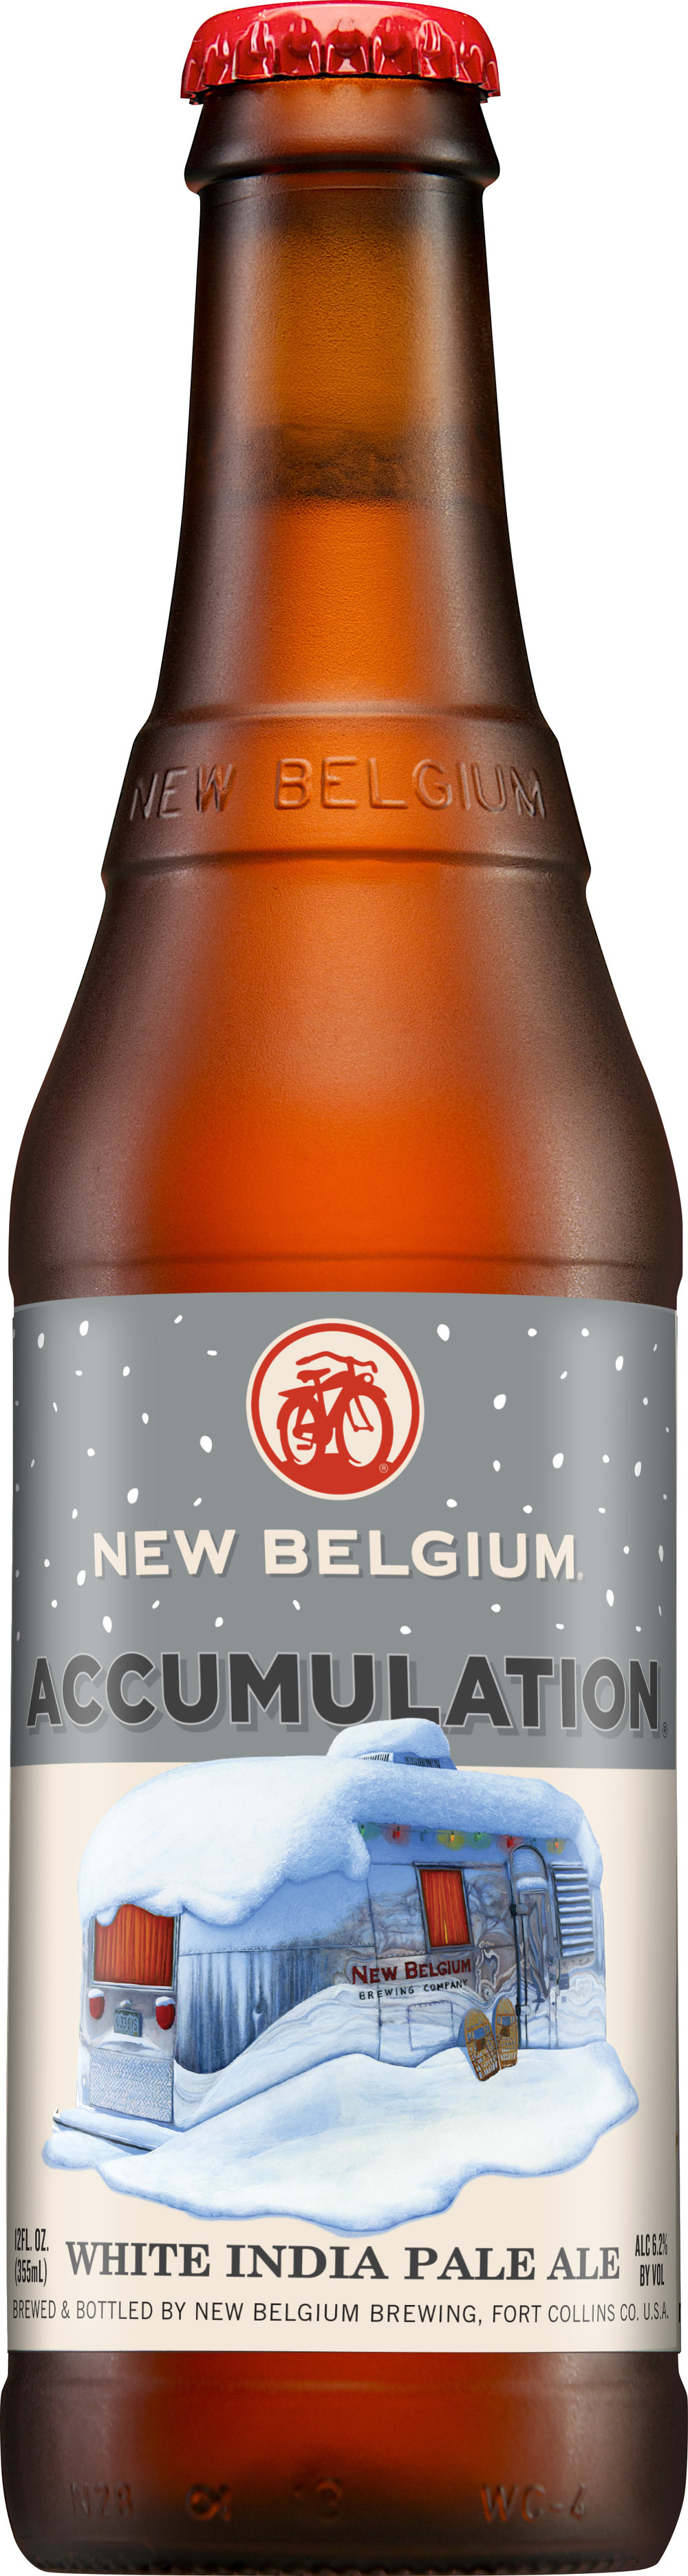 image courtesy New Belgium Brewing Company